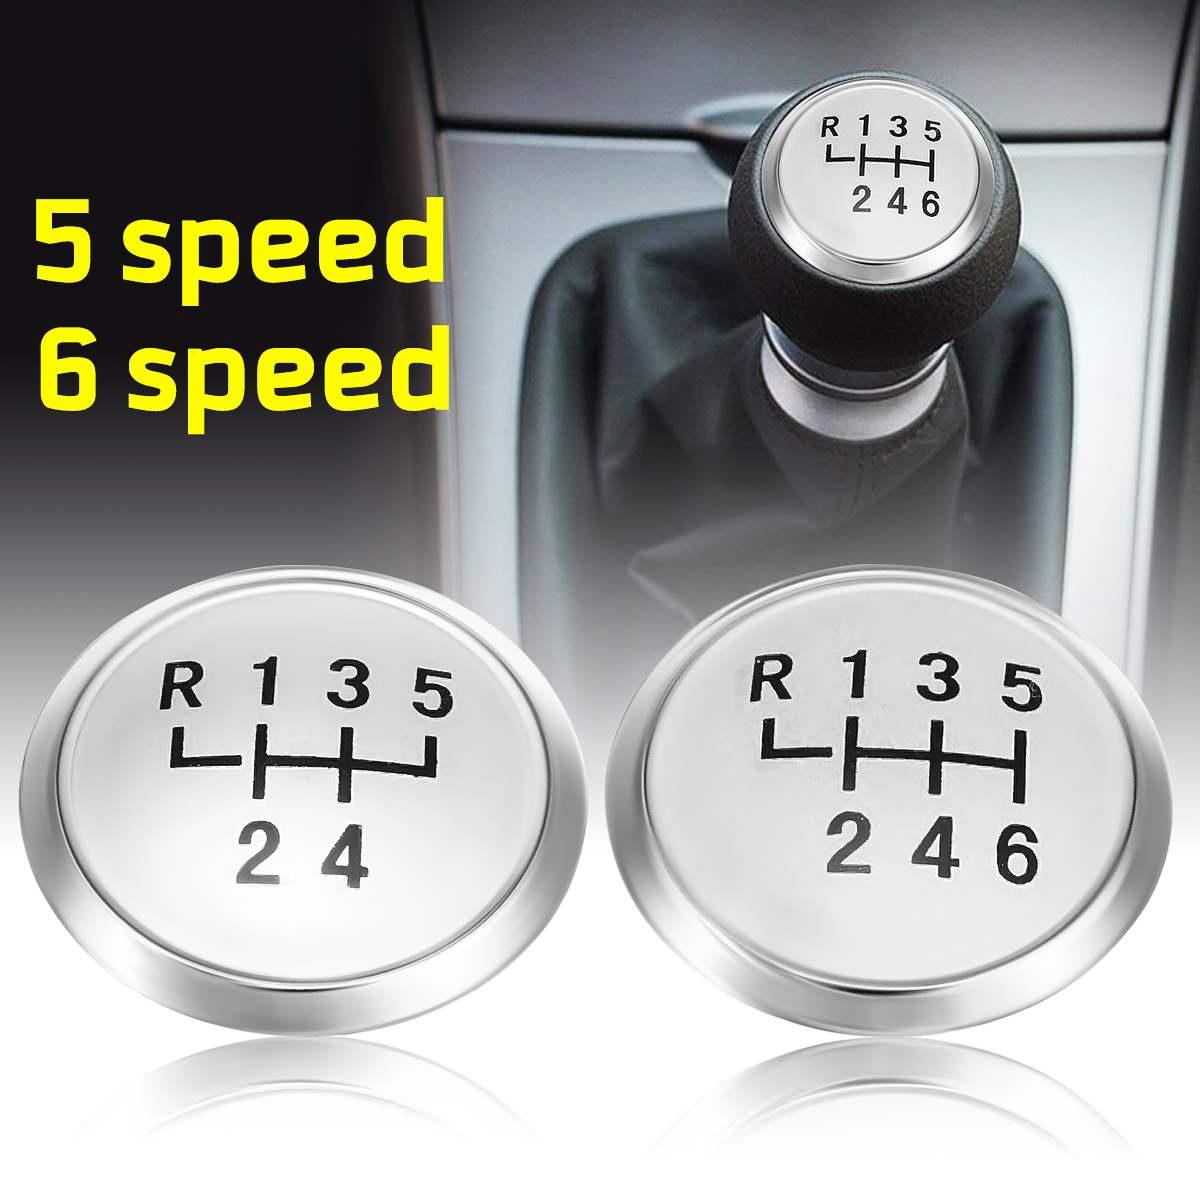 Chrome Gear 5 Speed Round Shift Knob Cap for VW Volkswagen Transporter T5